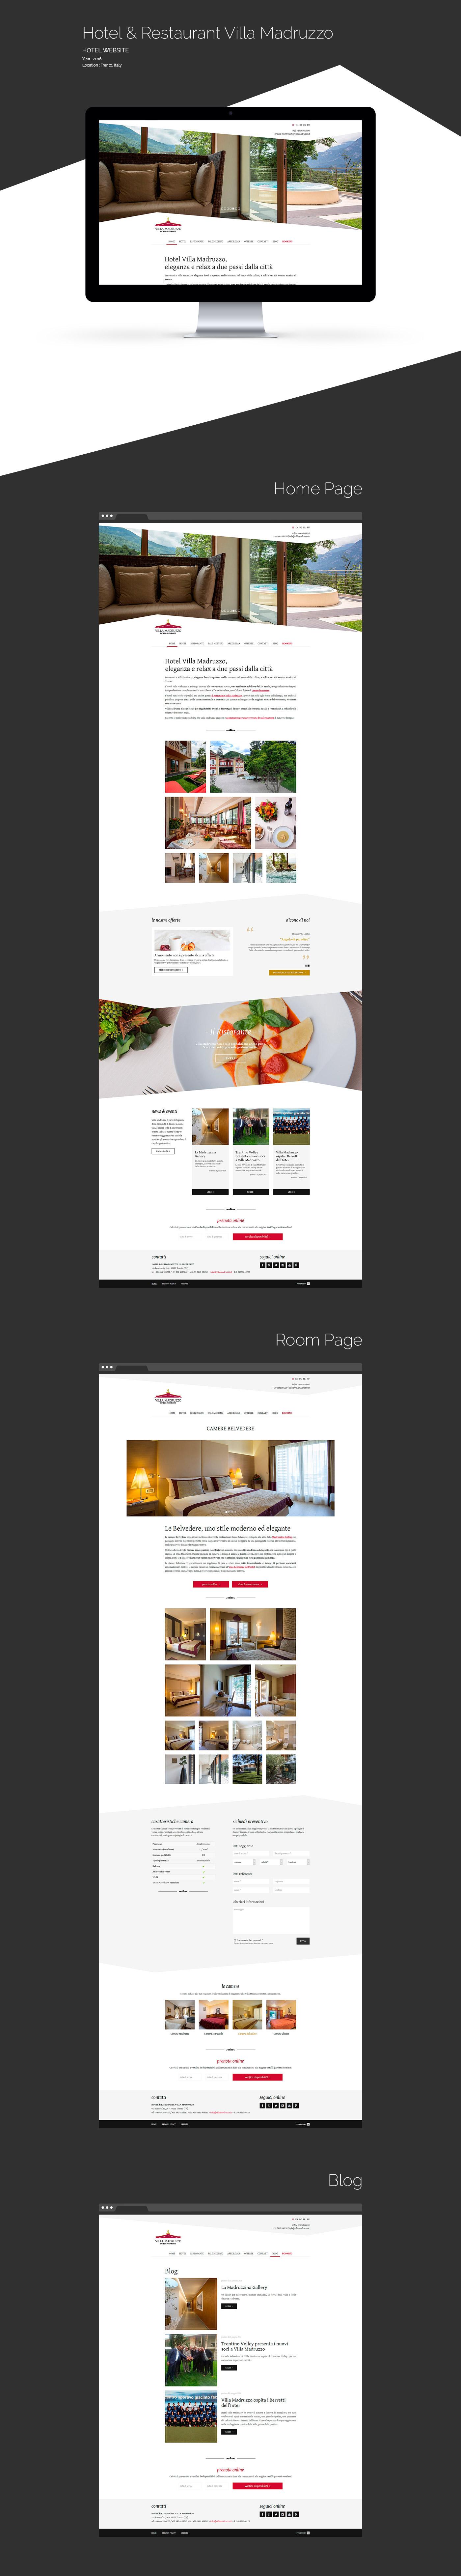 Webdesign Website Web wordpress code hotel restaurant Italy Travel tourism